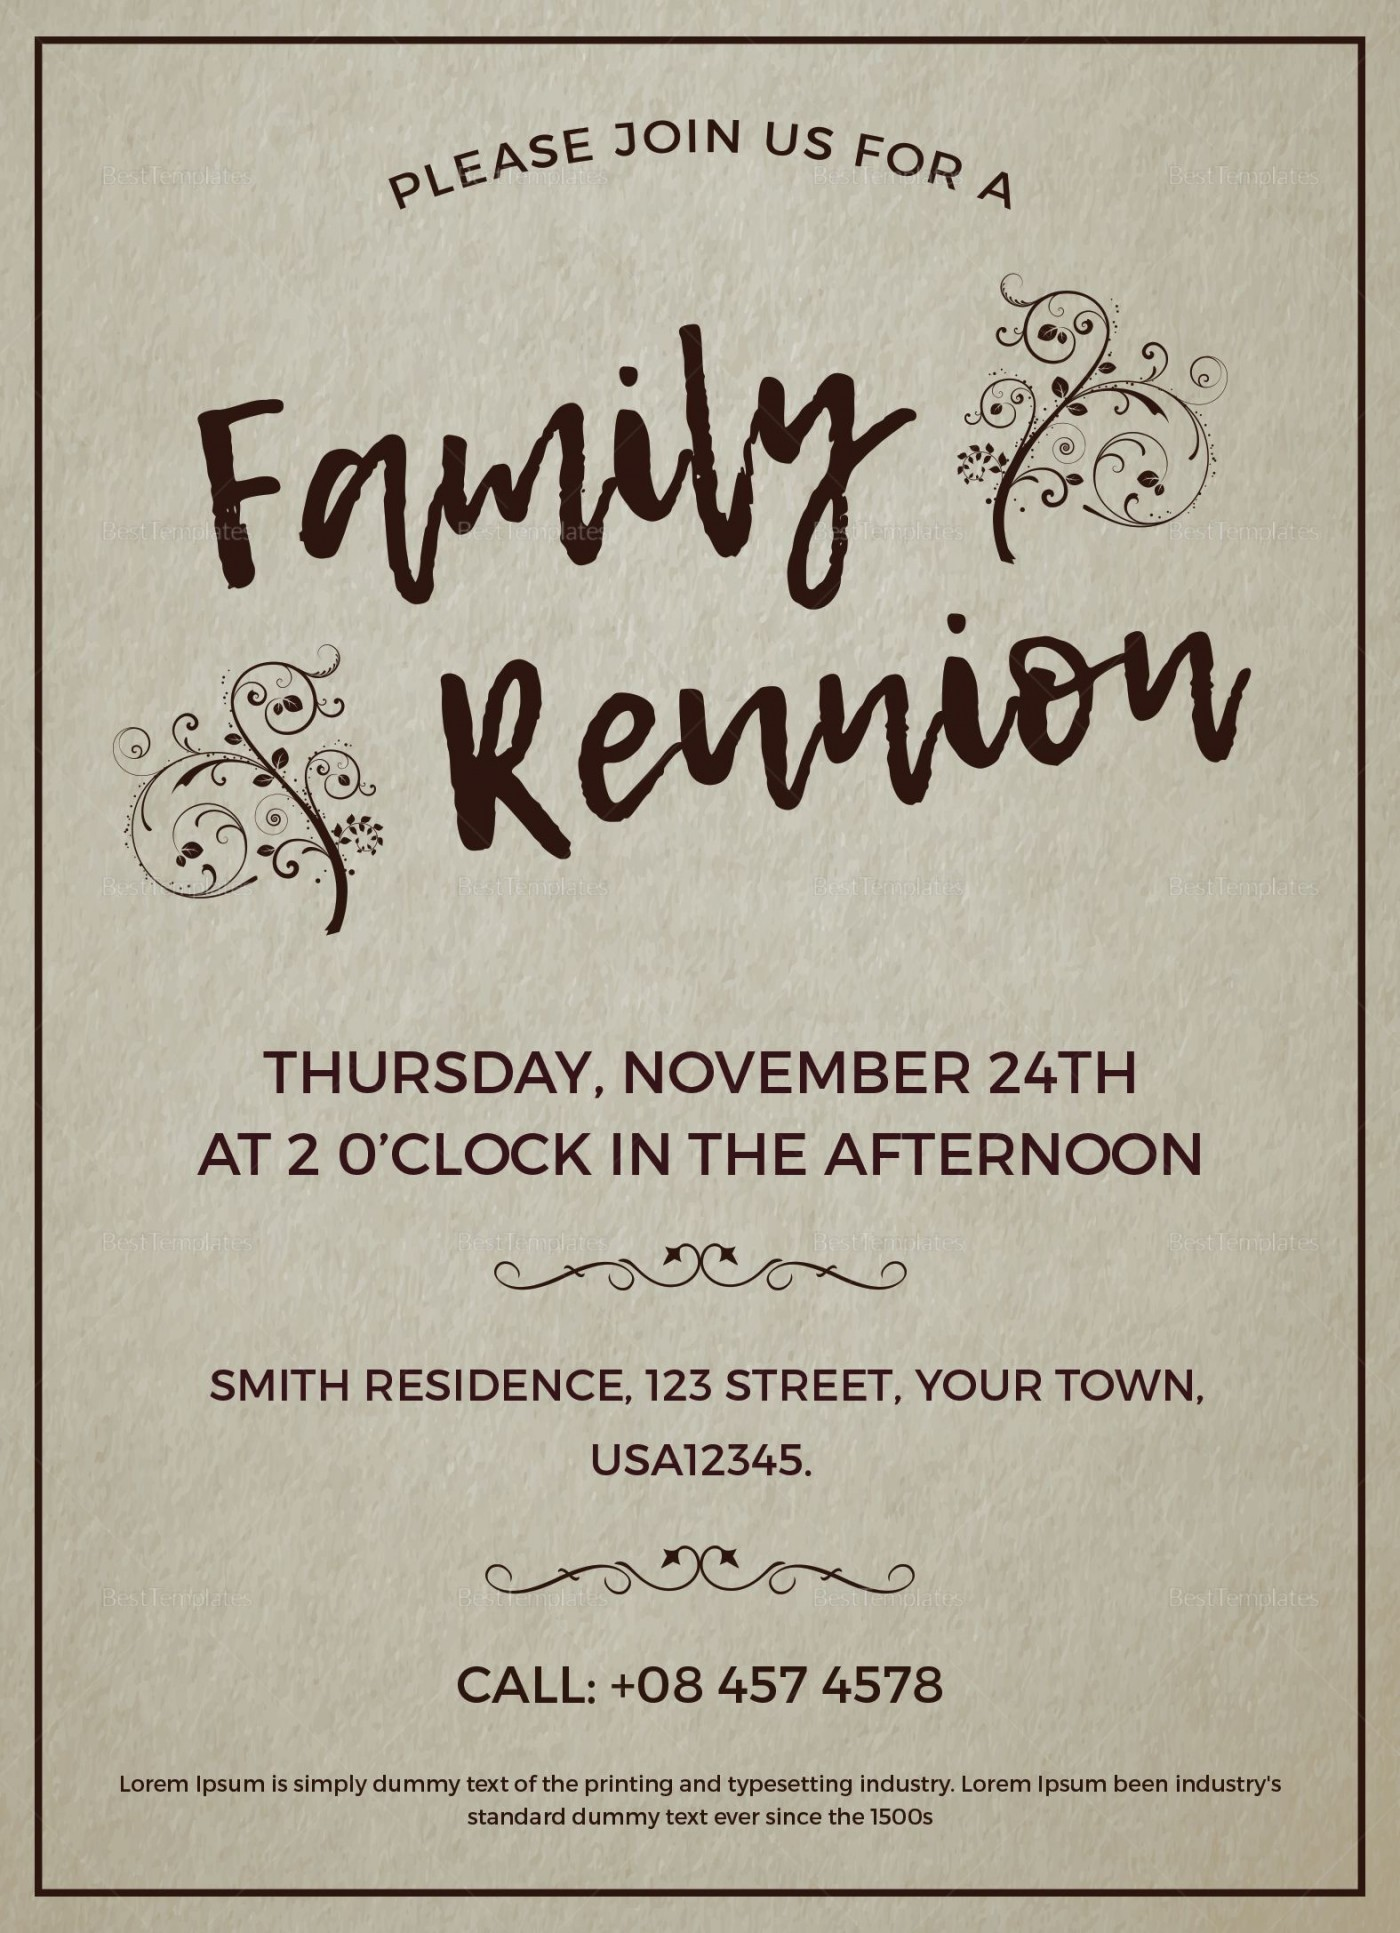 003 Excellent Free Downloadable Family Reunion Flyer Template Concept 1400